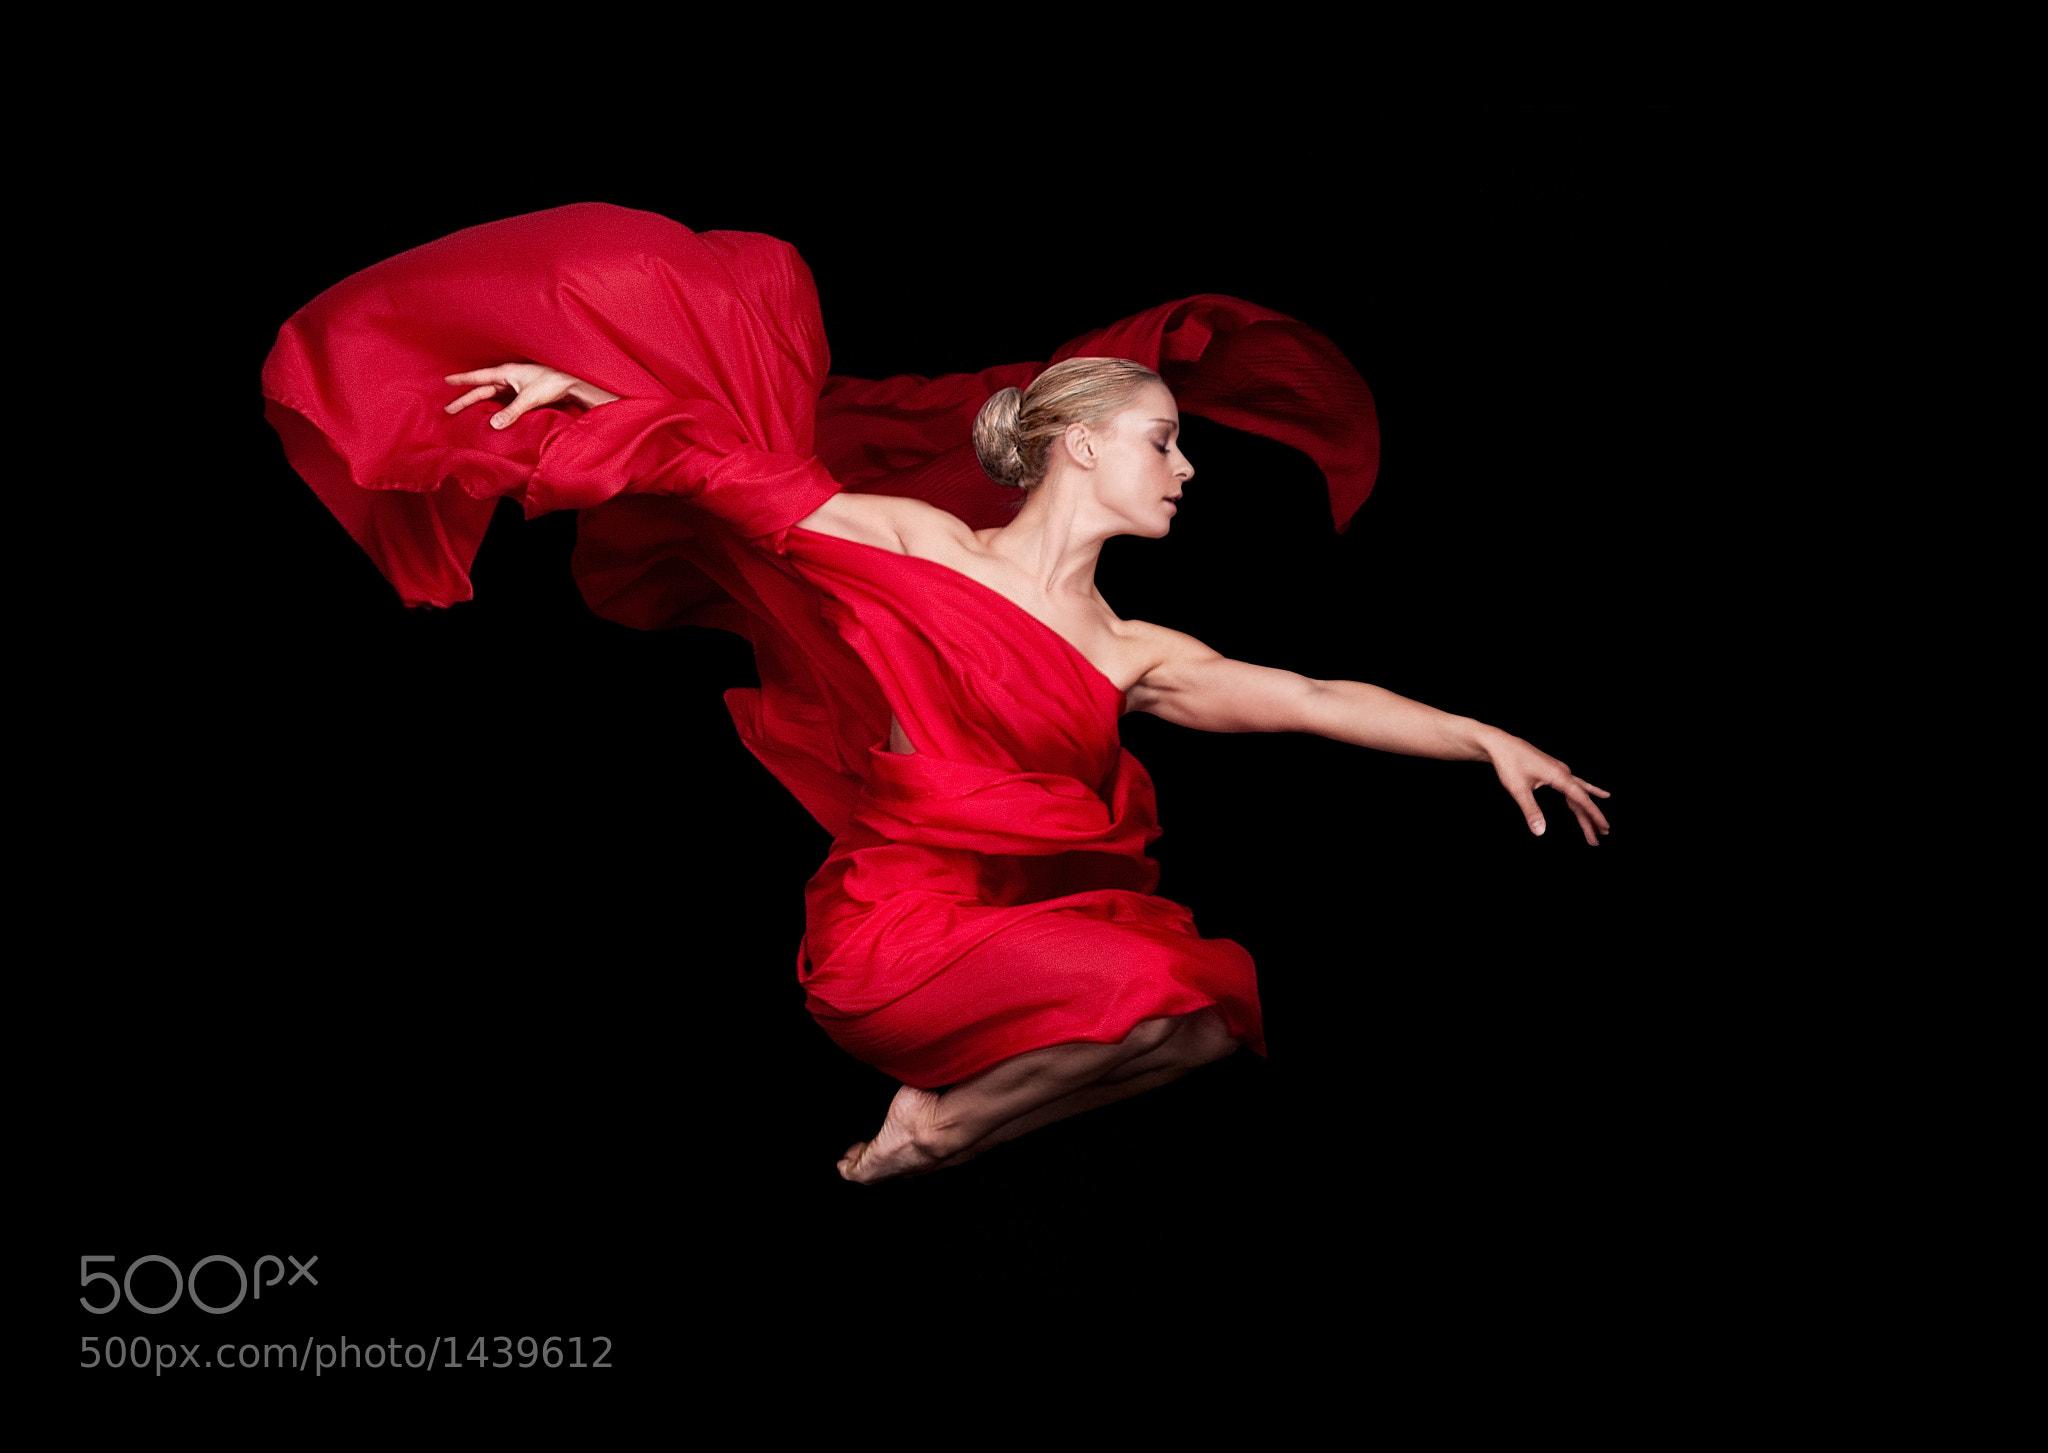 Photograph Fever by Jason Skinner on 500px